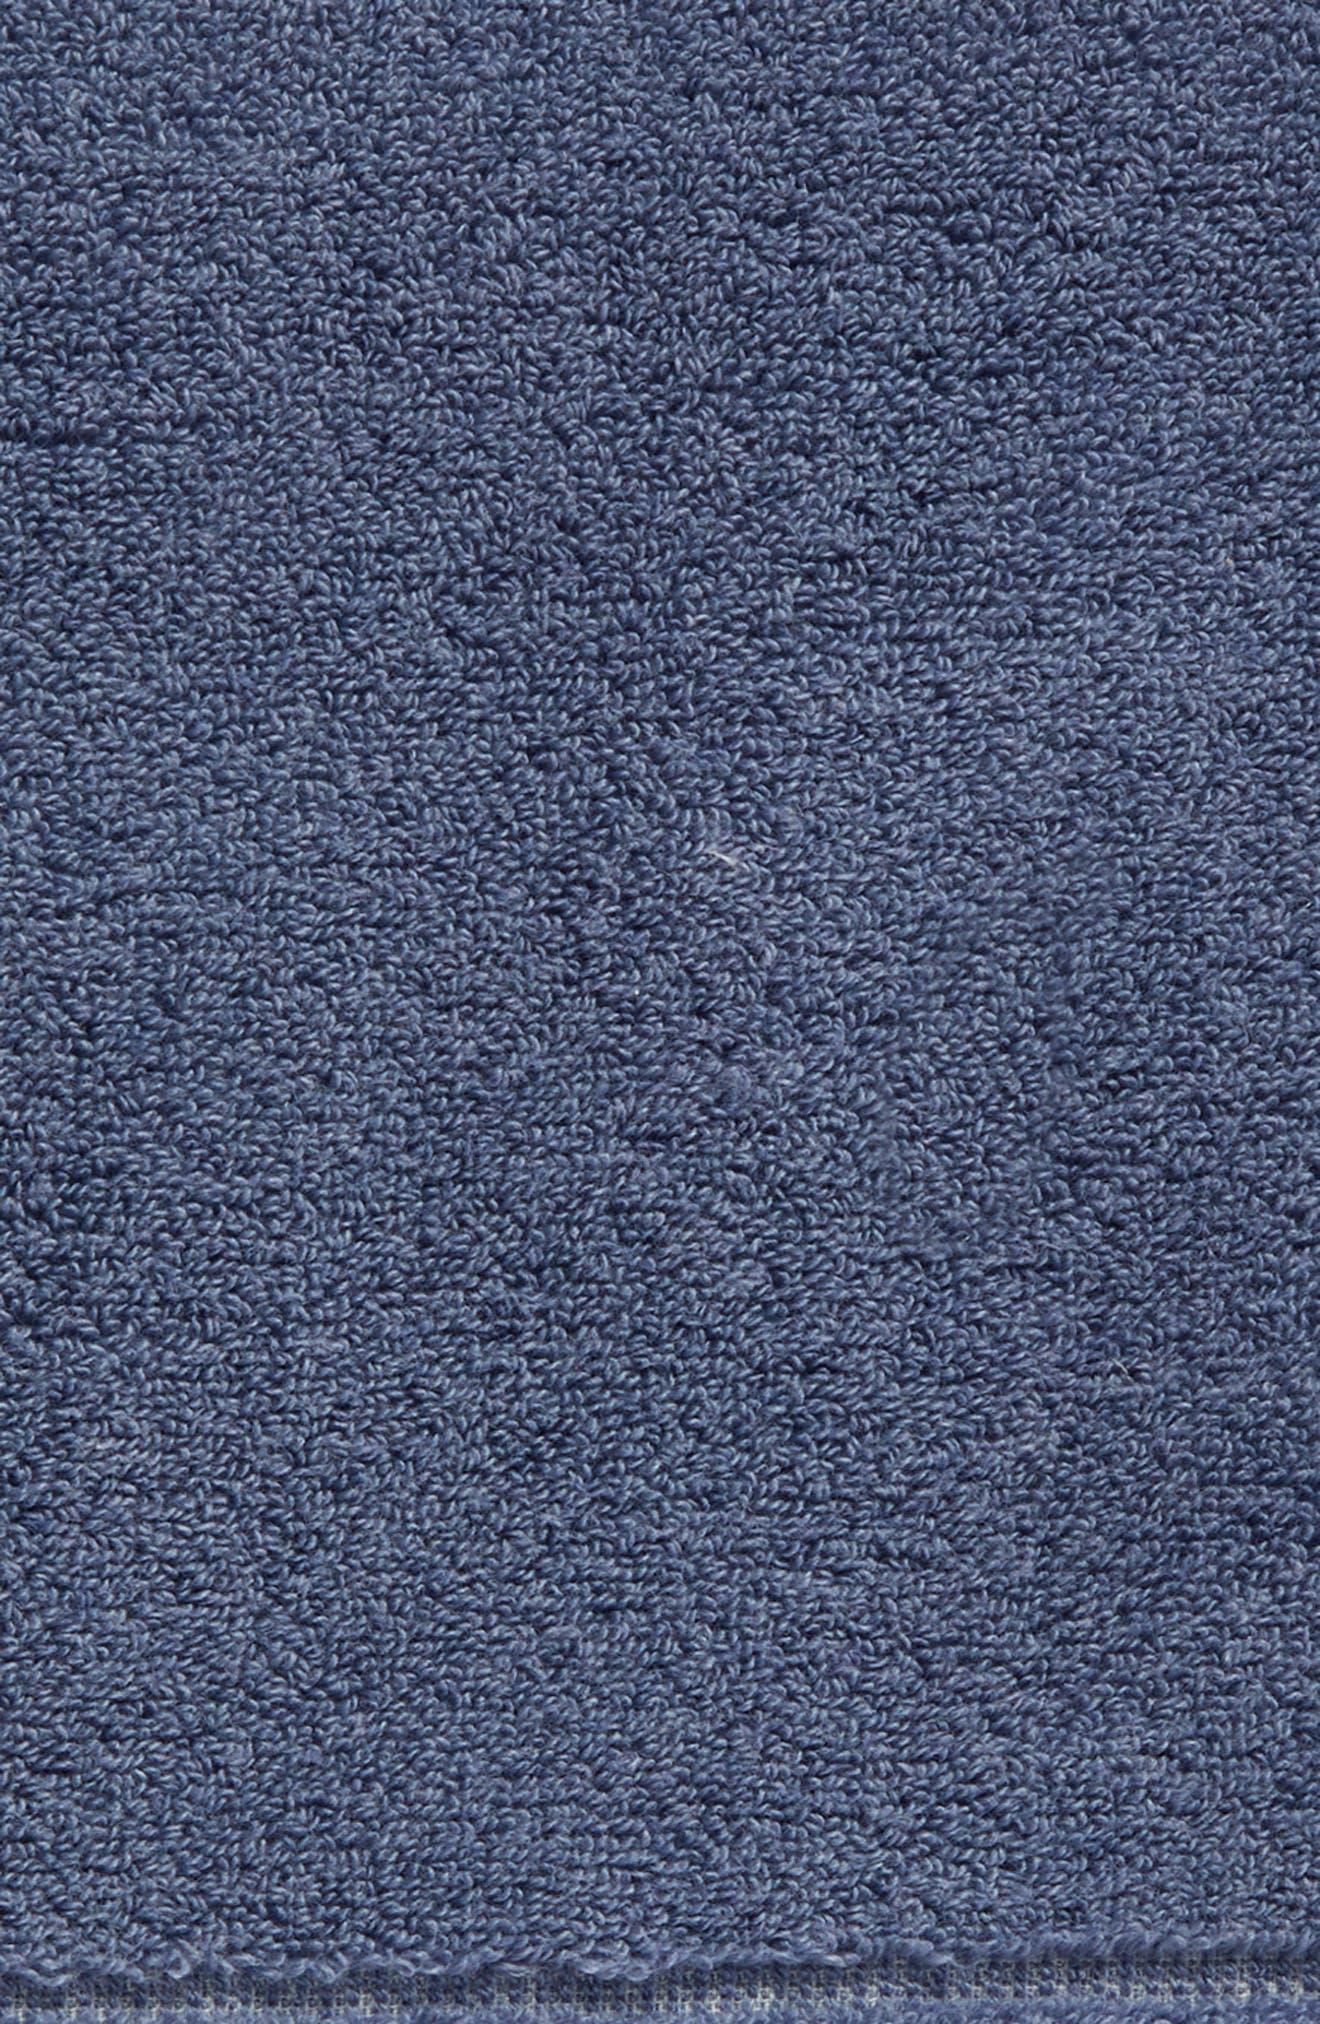 Organic Hydrocotton Bath Towel,                             Alternate thumbnail 4, color,                             Navy Sky